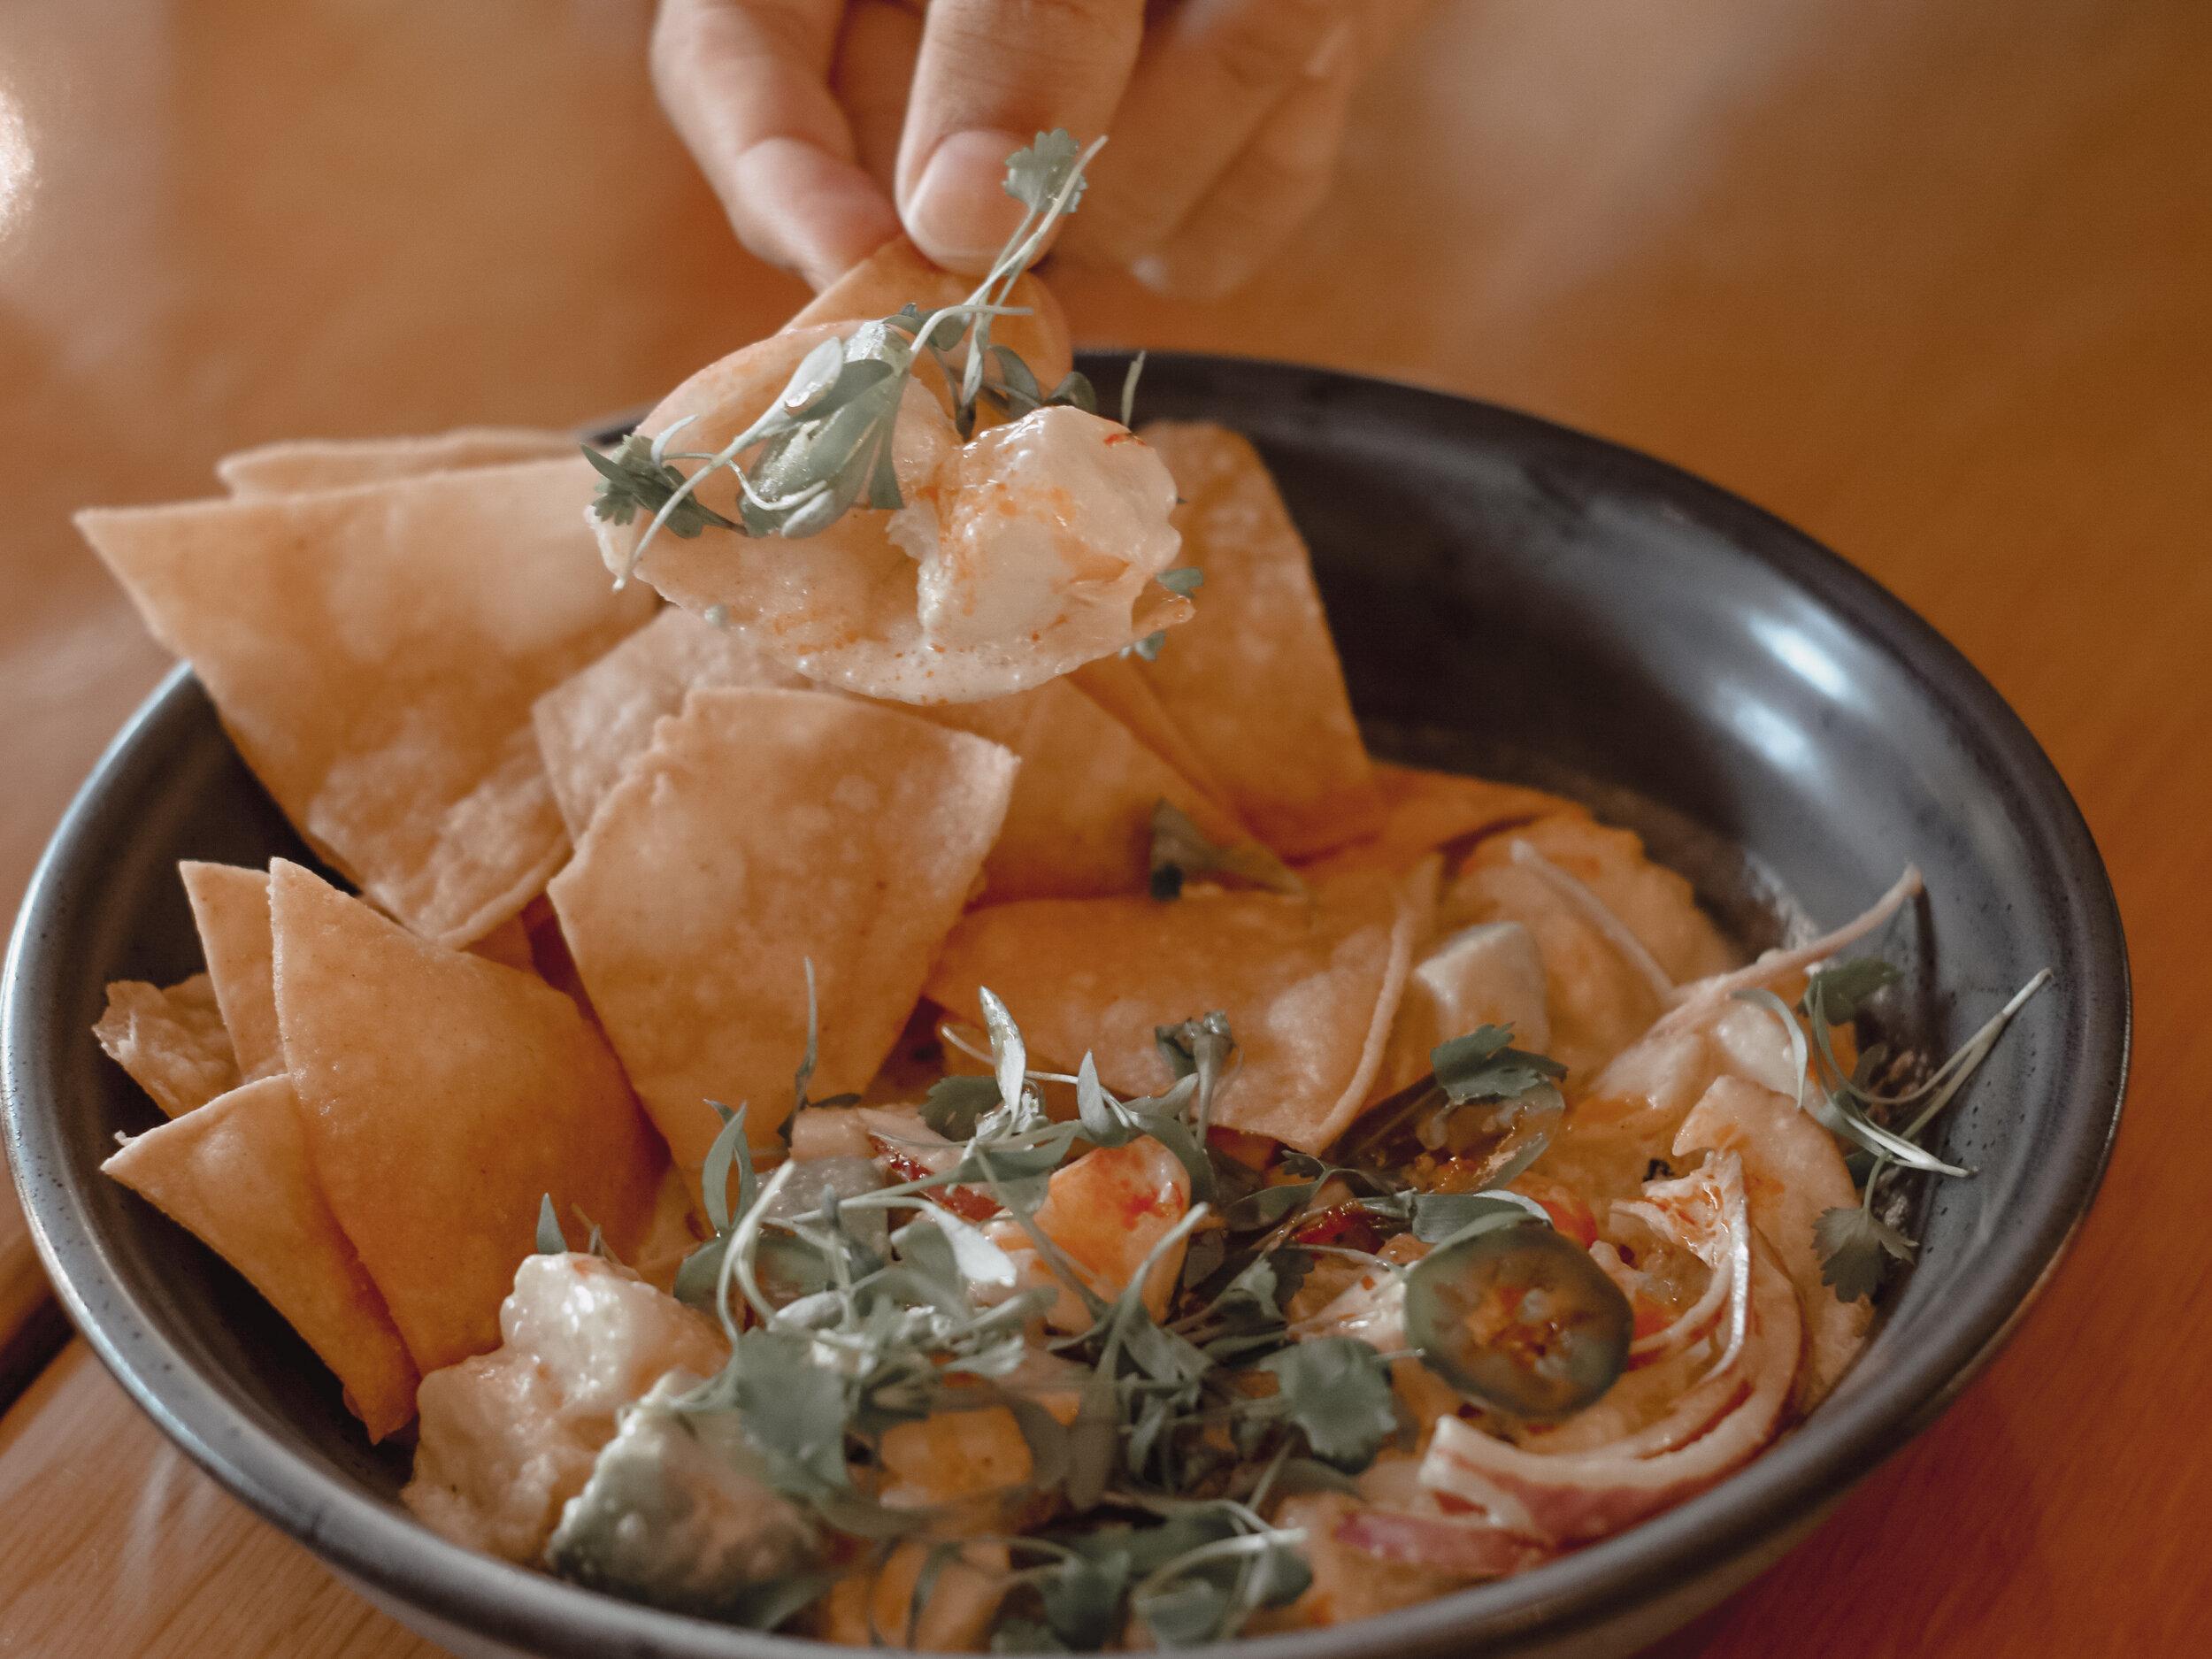 Eats Kitchen & Irvine Shrimp Ceviche on Chip | AMANDANHAMMOND.COM